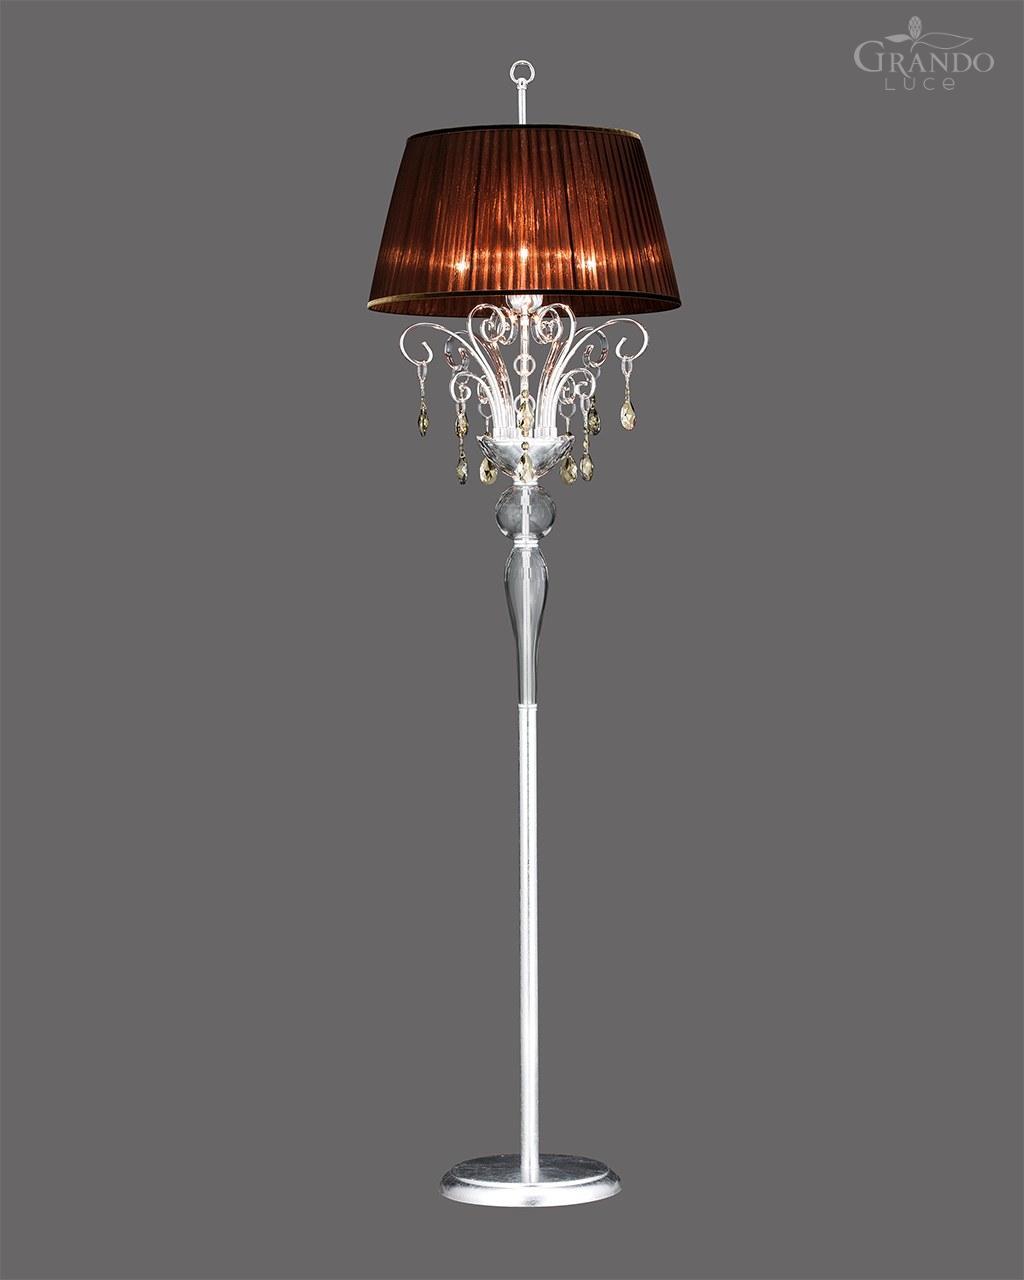 120 Fl Silver Leaf Crystal Floor Lamp Grandoluce